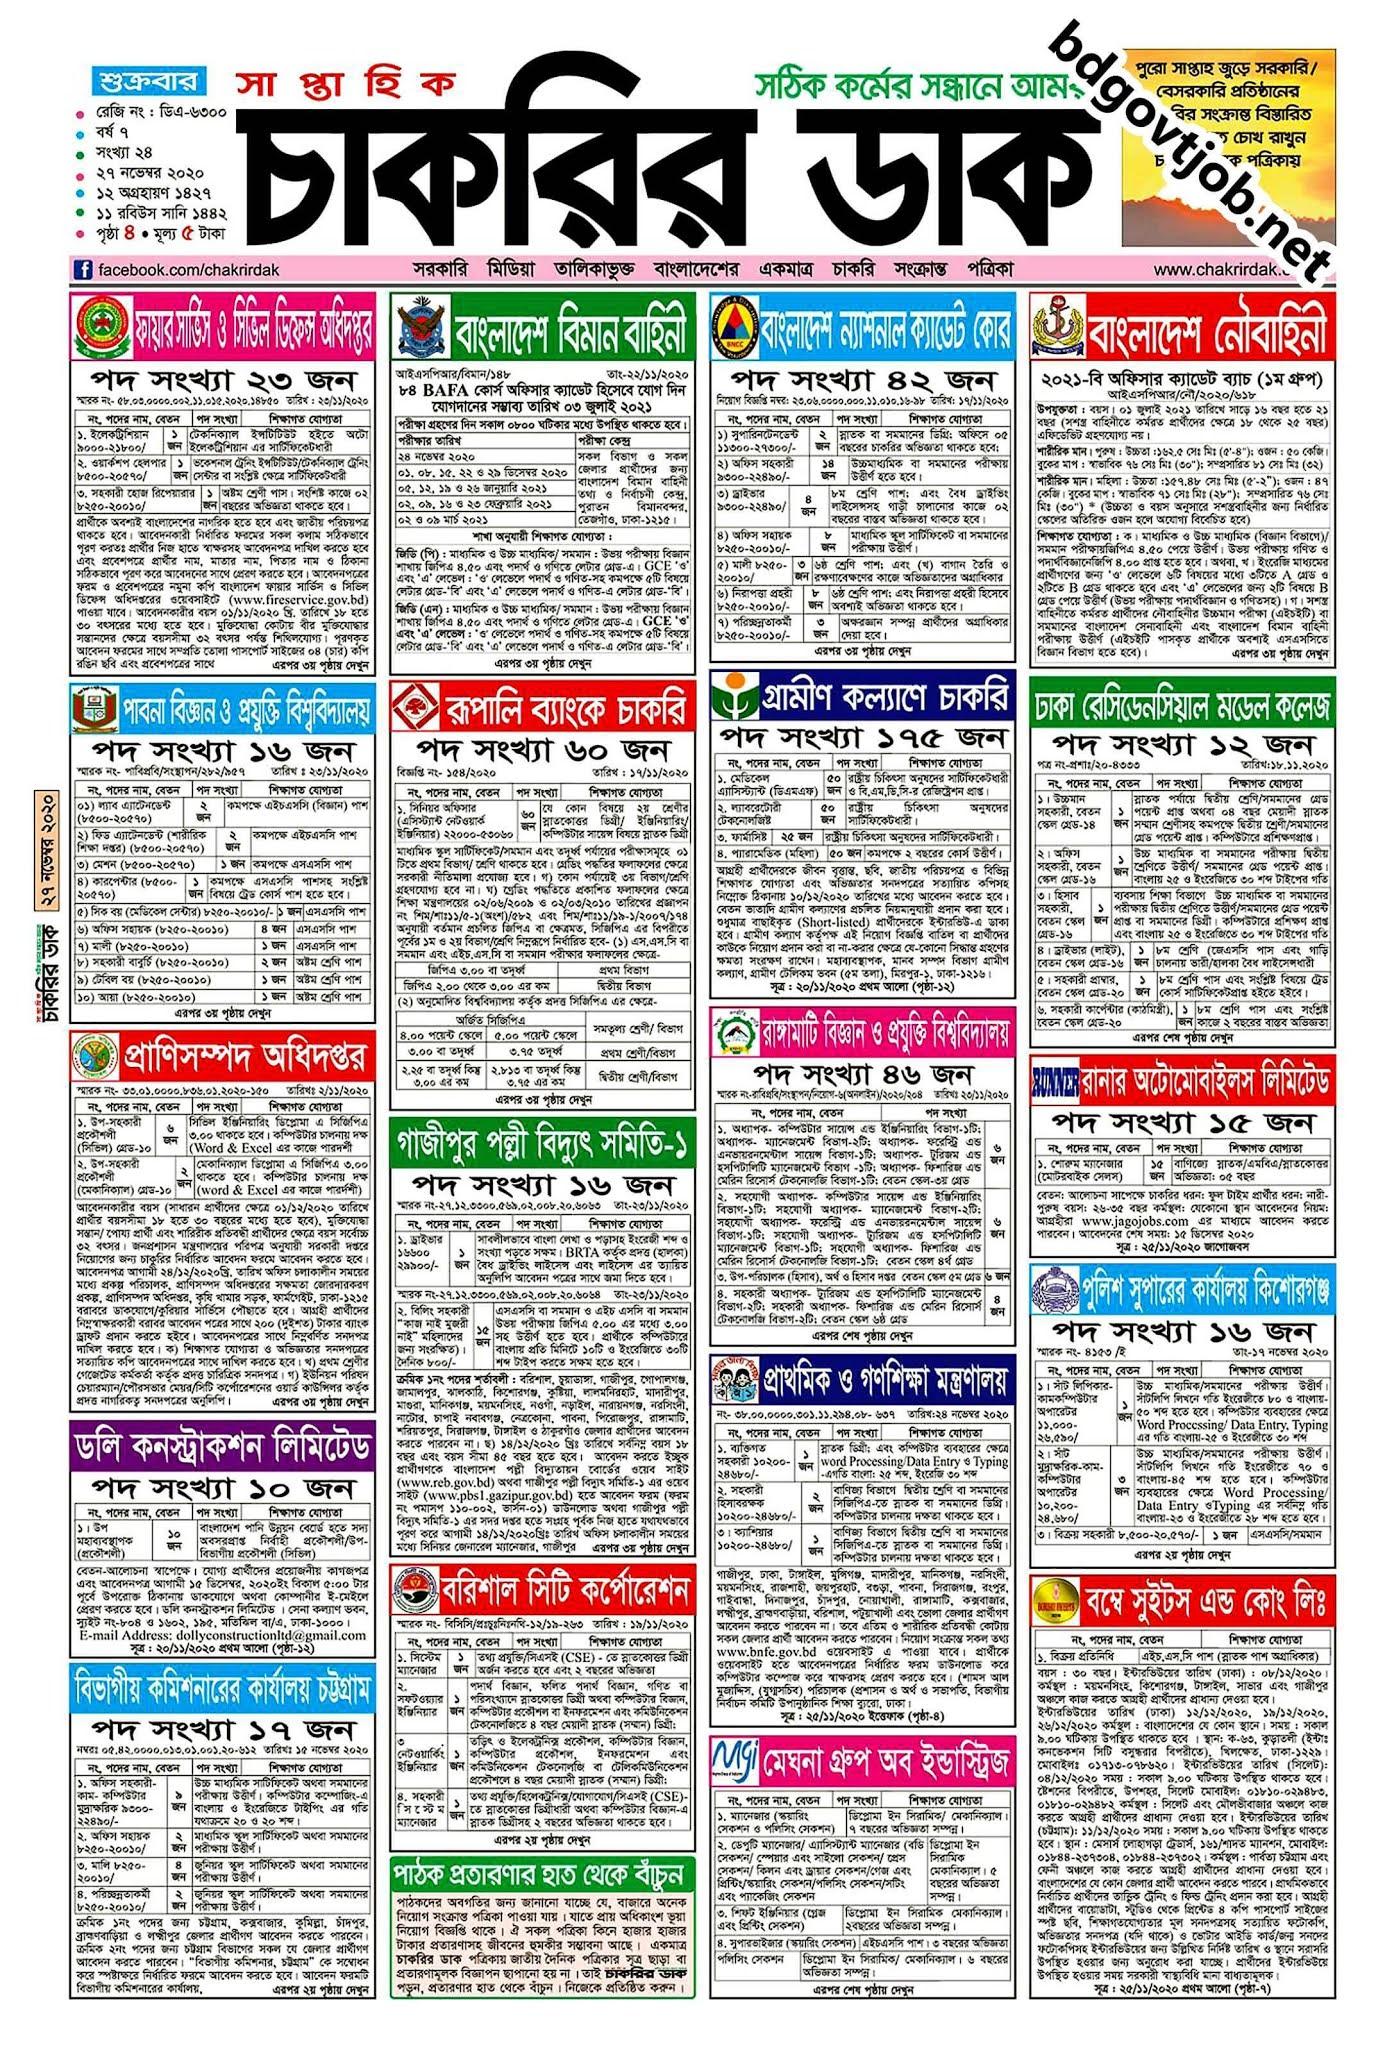 Chakrir Dak Weekly Jobs Newspaper 27 November 2020 - সাপ্তাহিক চাকরির ডাক পত্রিকা ২৭ নভেম্বর ২০২০